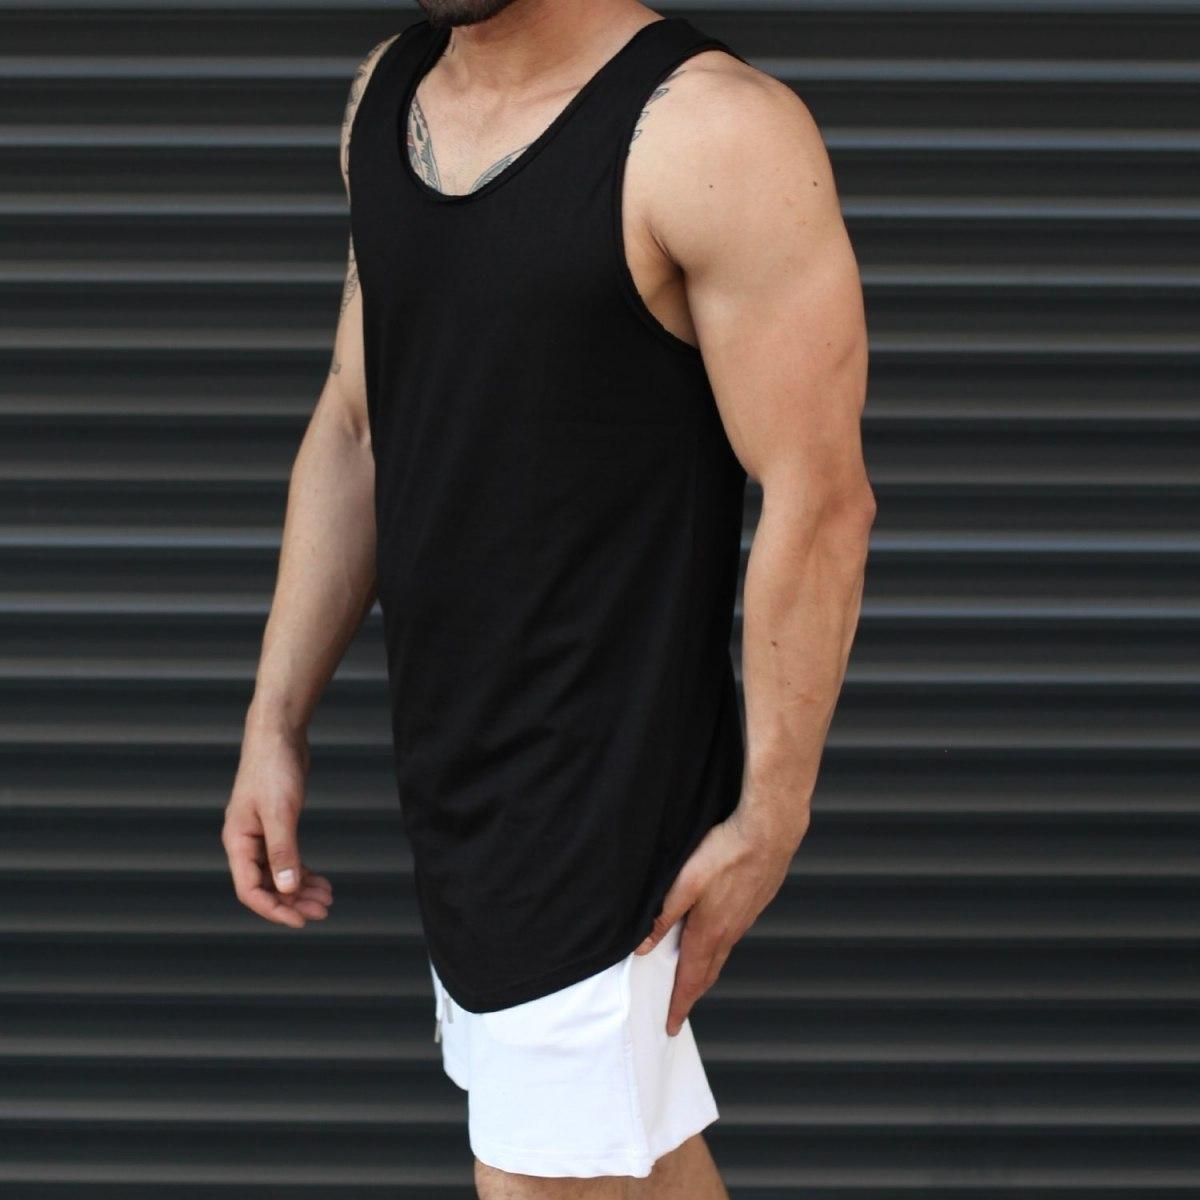 Men's Athletic Sleeveless...